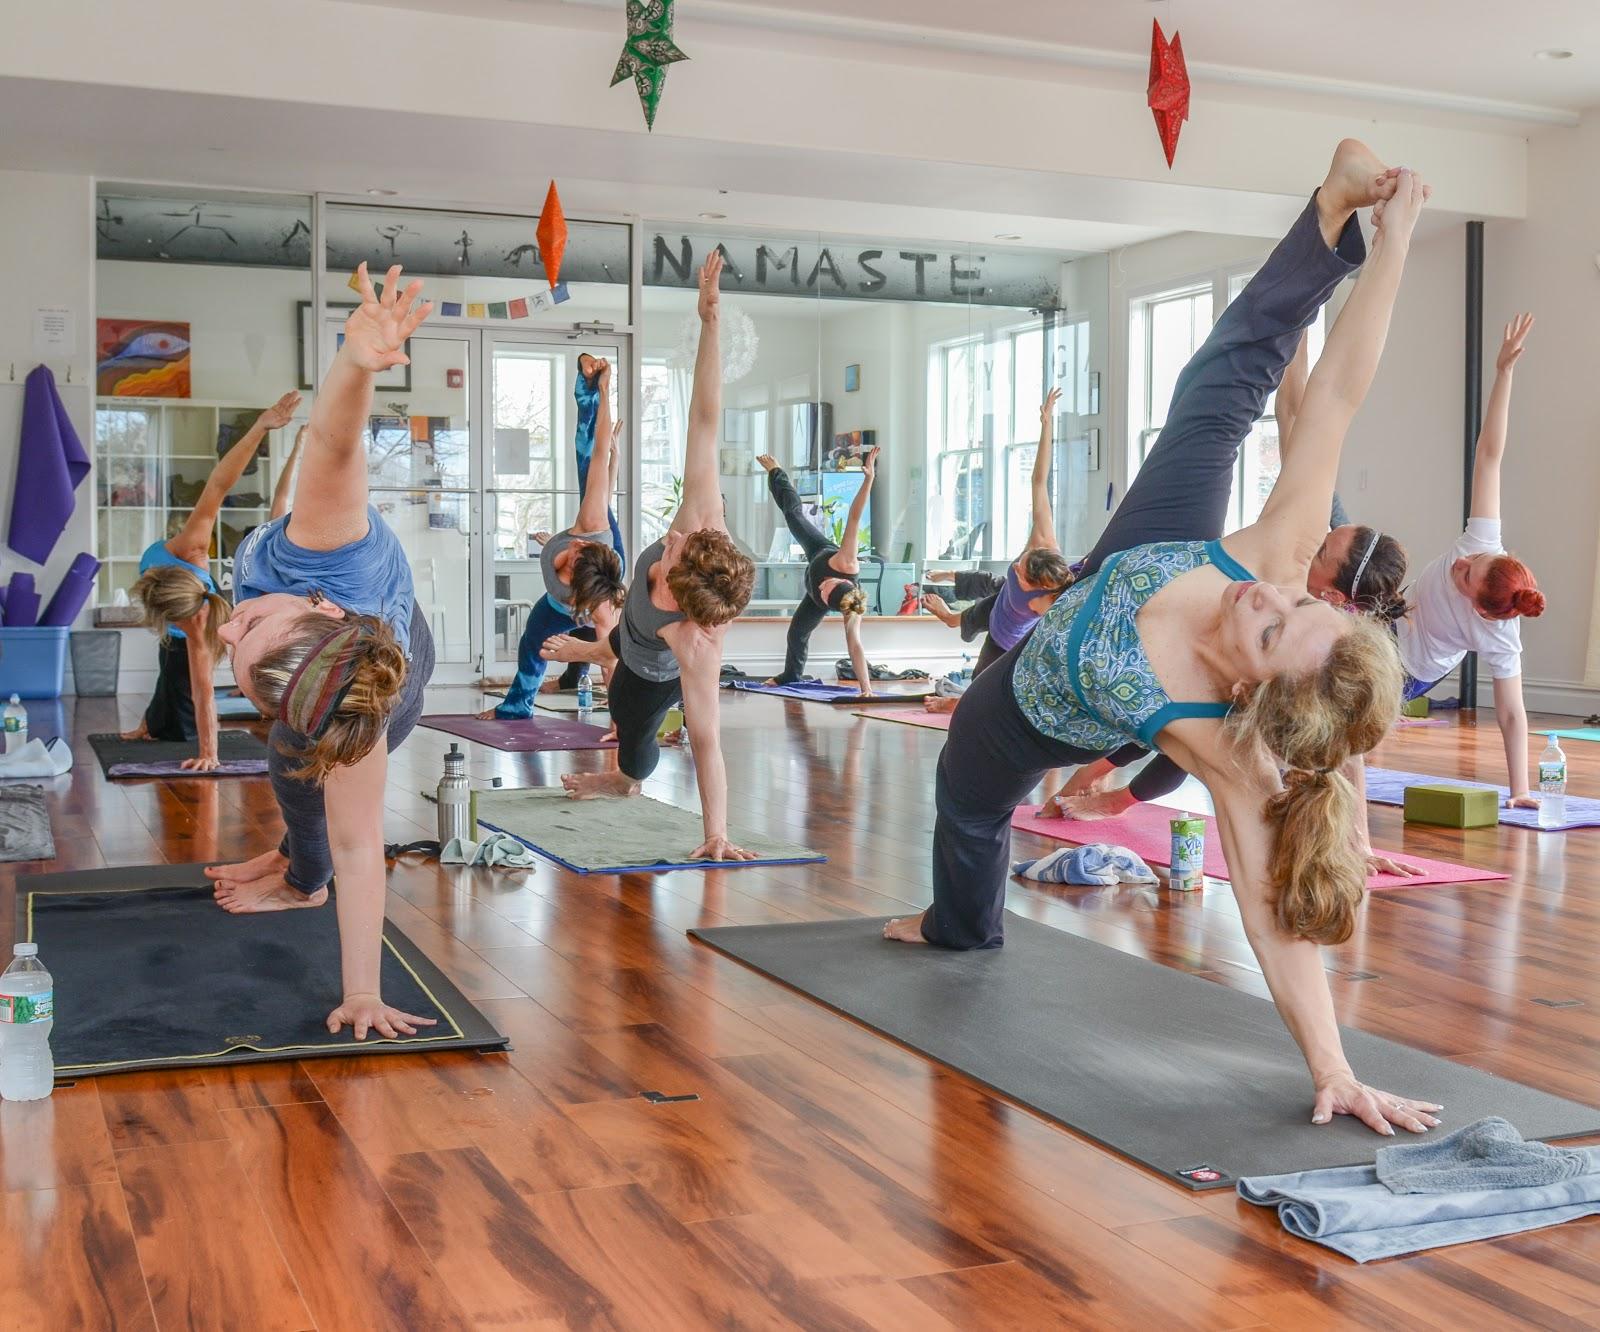 11+ Easy Yoga Poses To Do | Yoga Poses